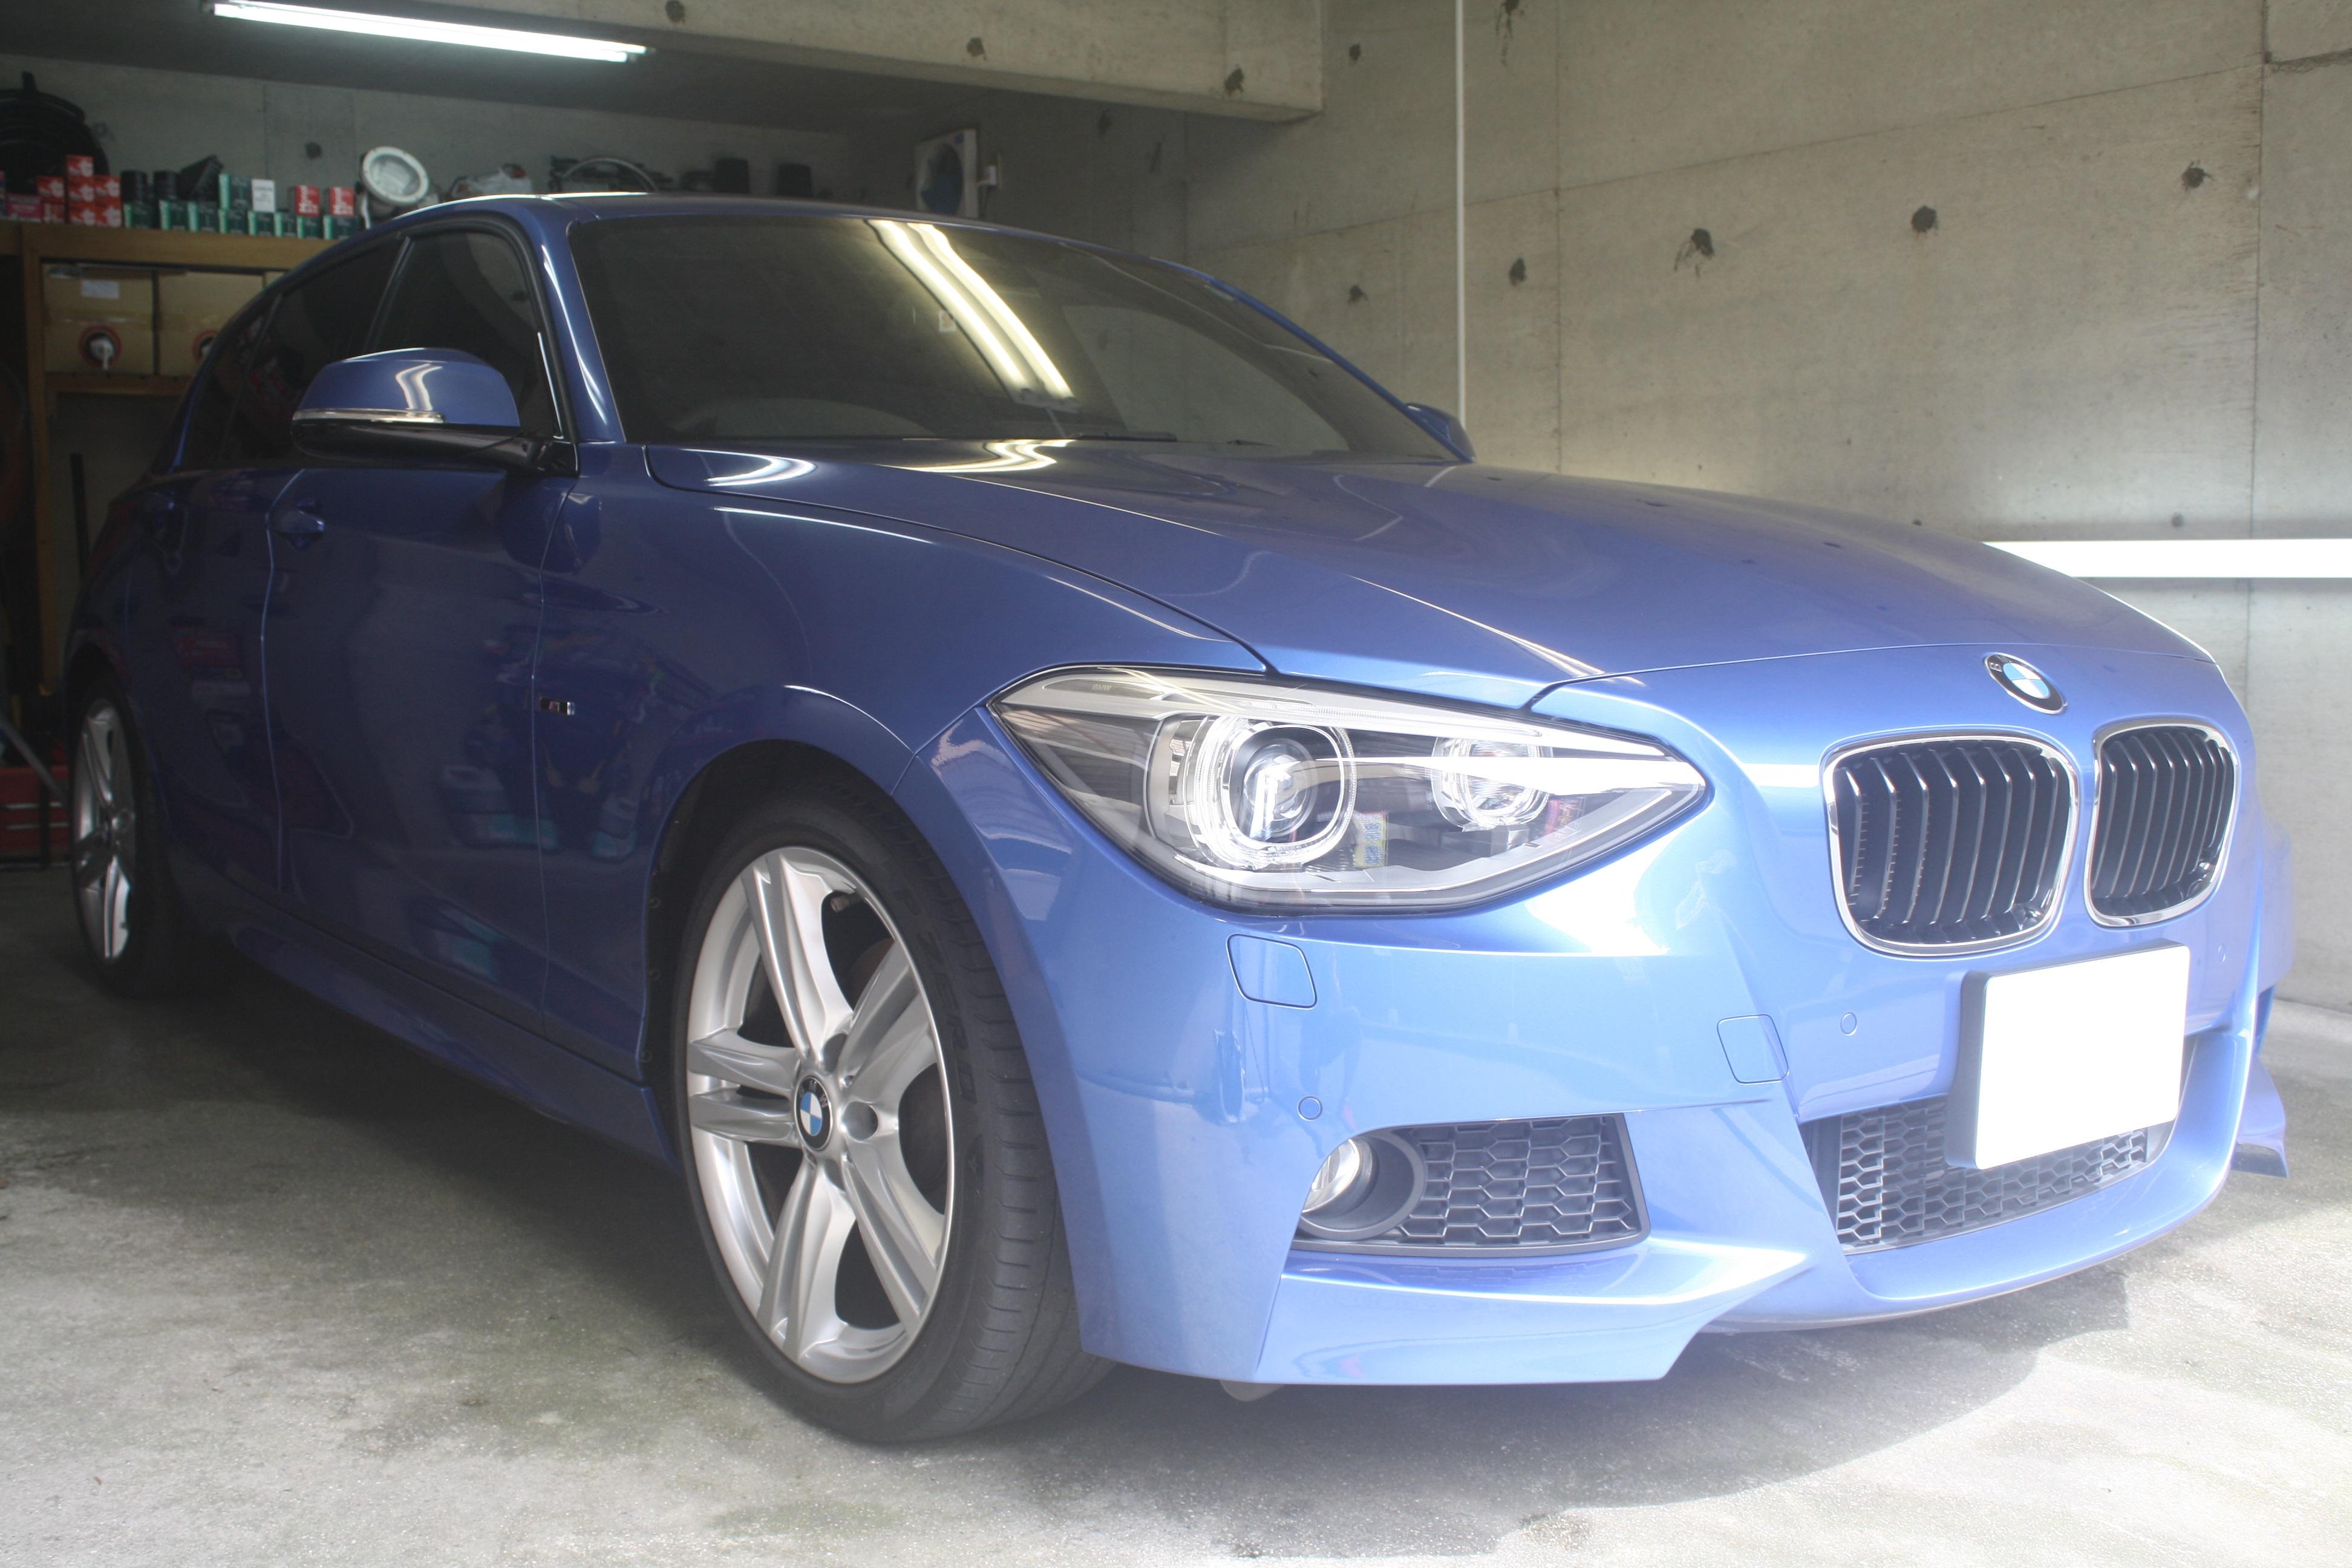 BMWにガラスコーティング プレミアム